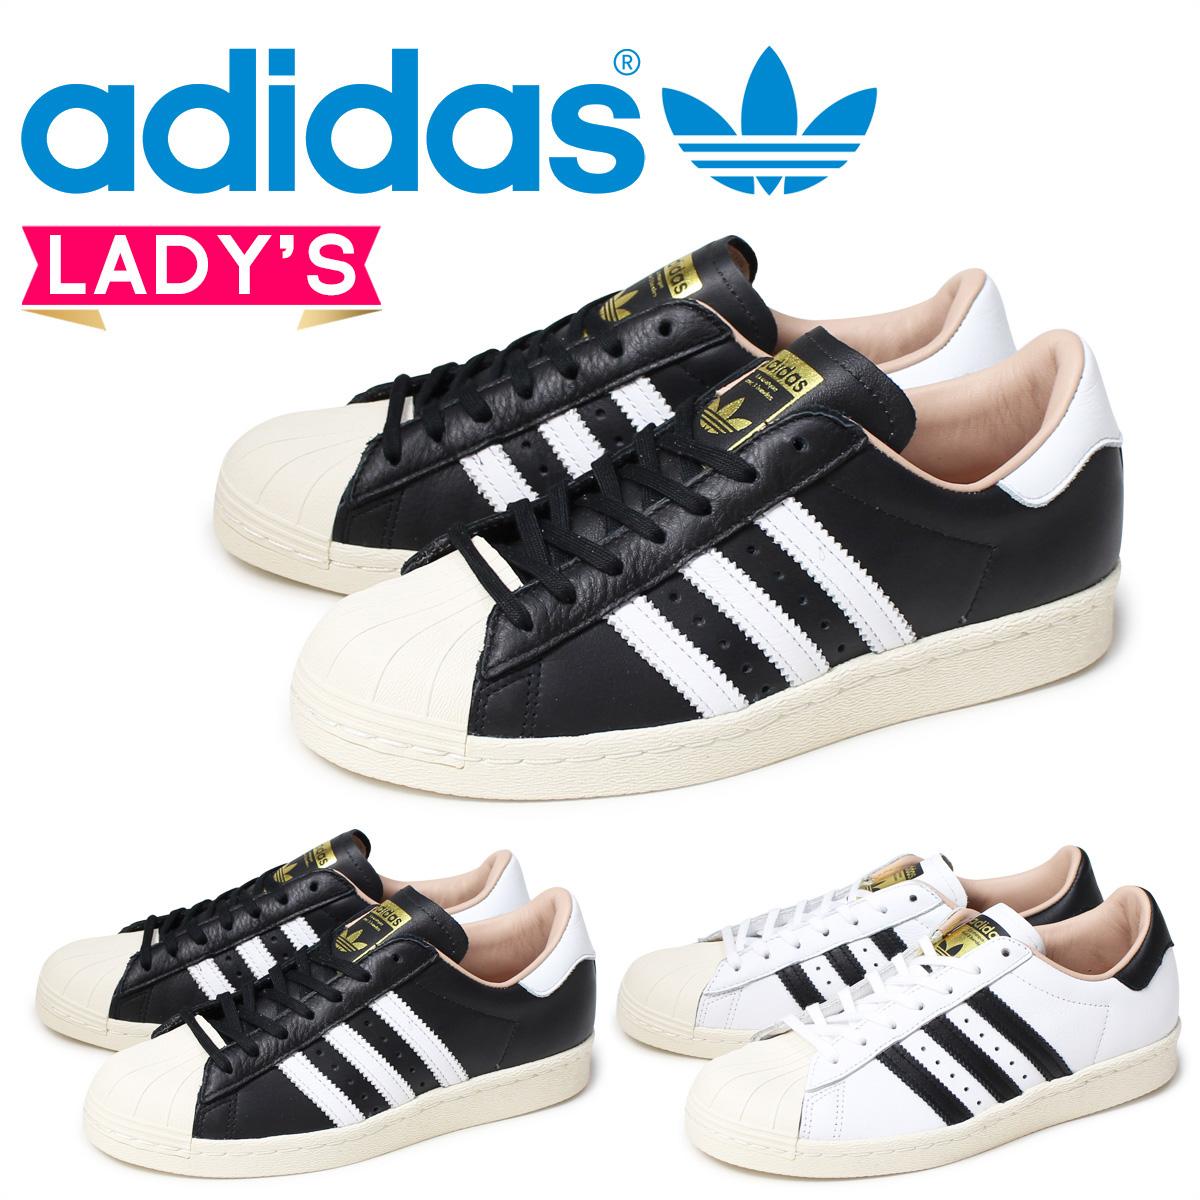 adidas スーパースター アディダス Originals レディース スニーカー SUPERSTAR 80S W BY2957 BY2958 靴 ホワイト 白 ブラック 黒 オリジナルス